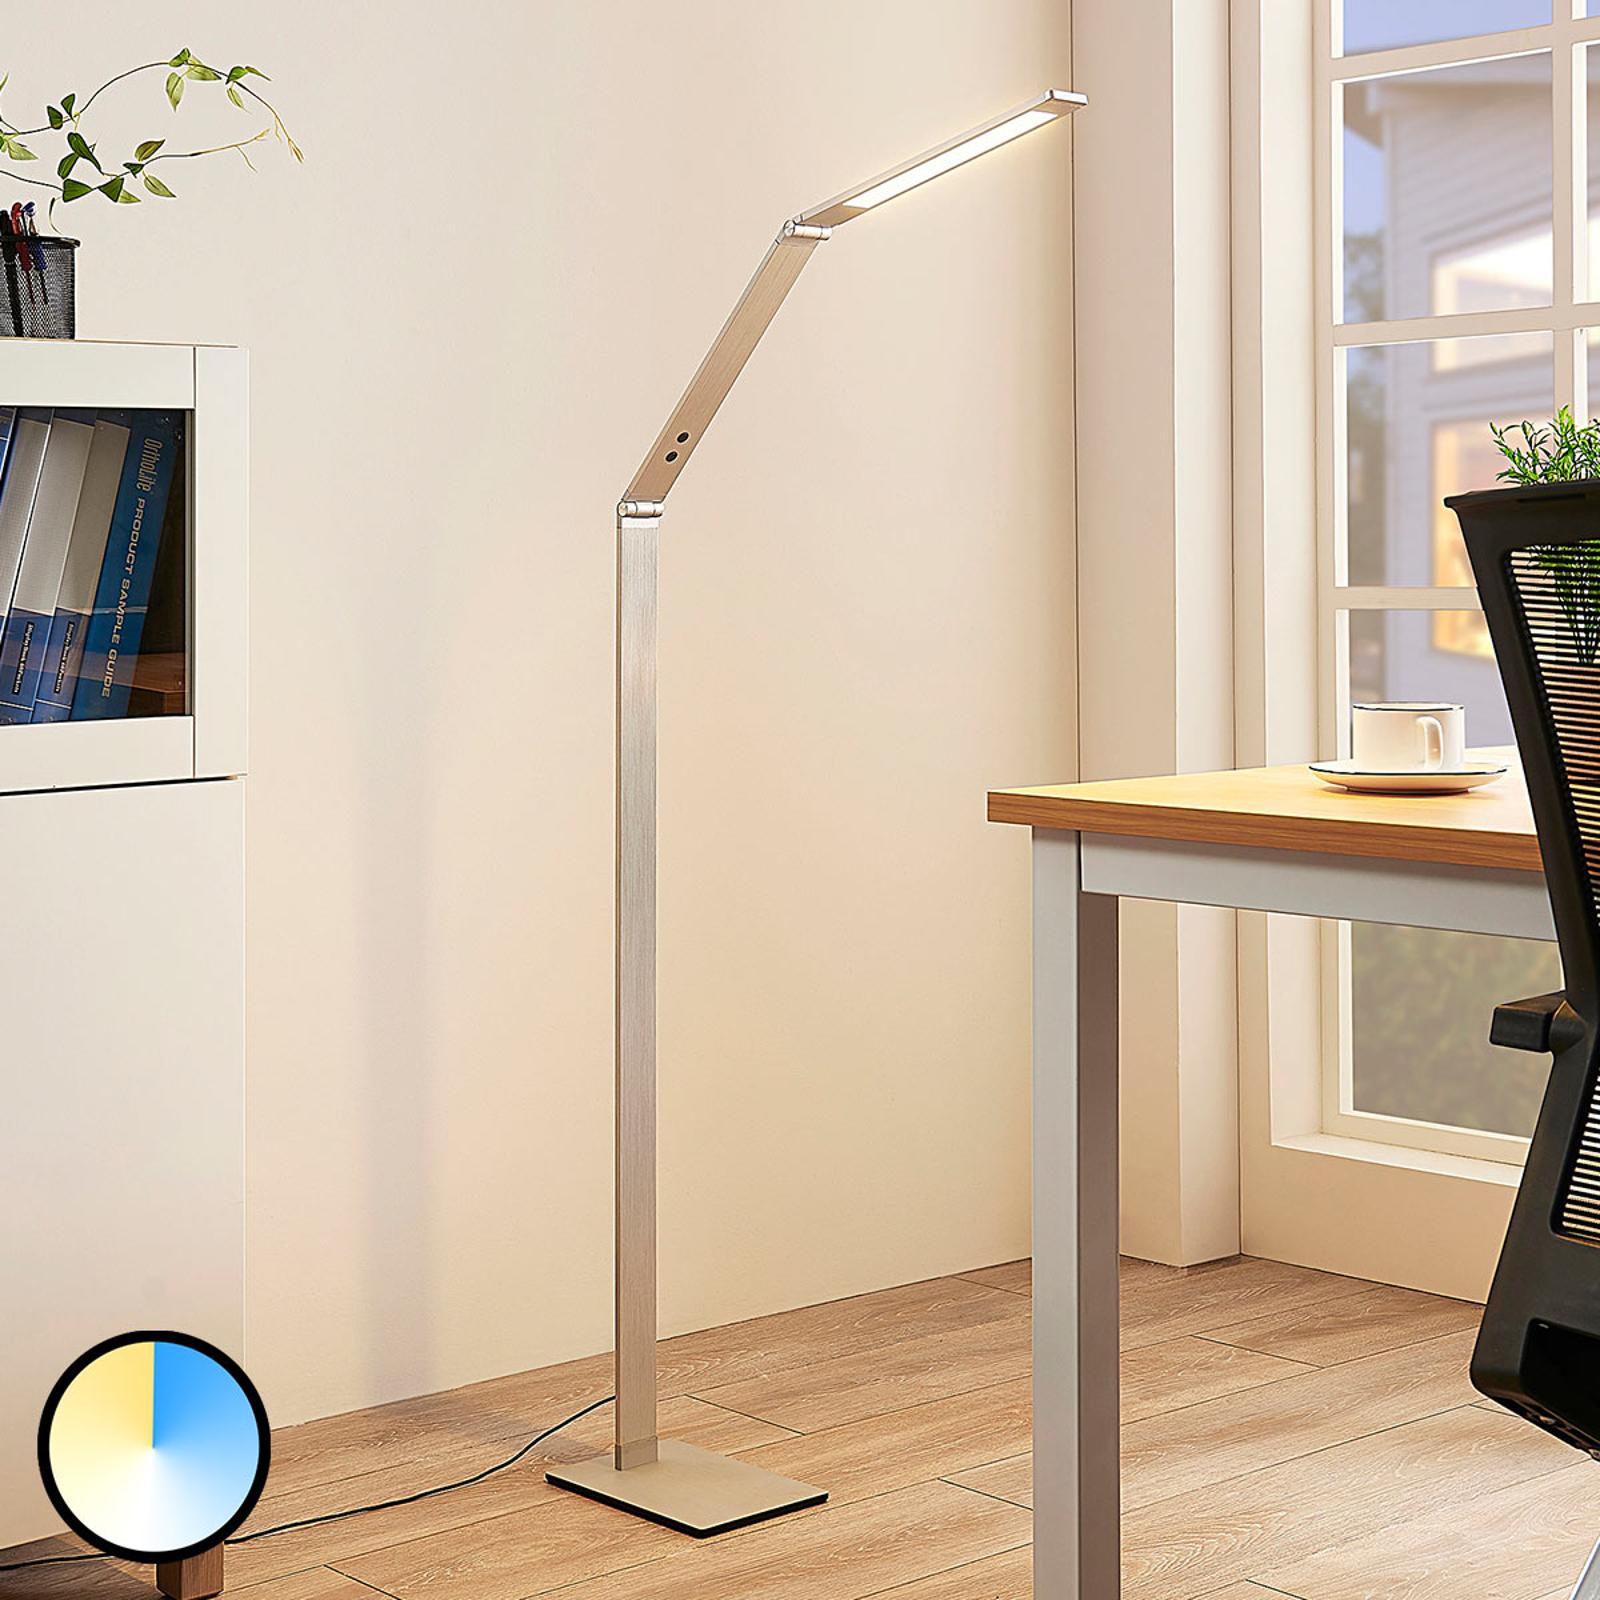 Filigran LED-leselampe Nicano, variabel lysfarge